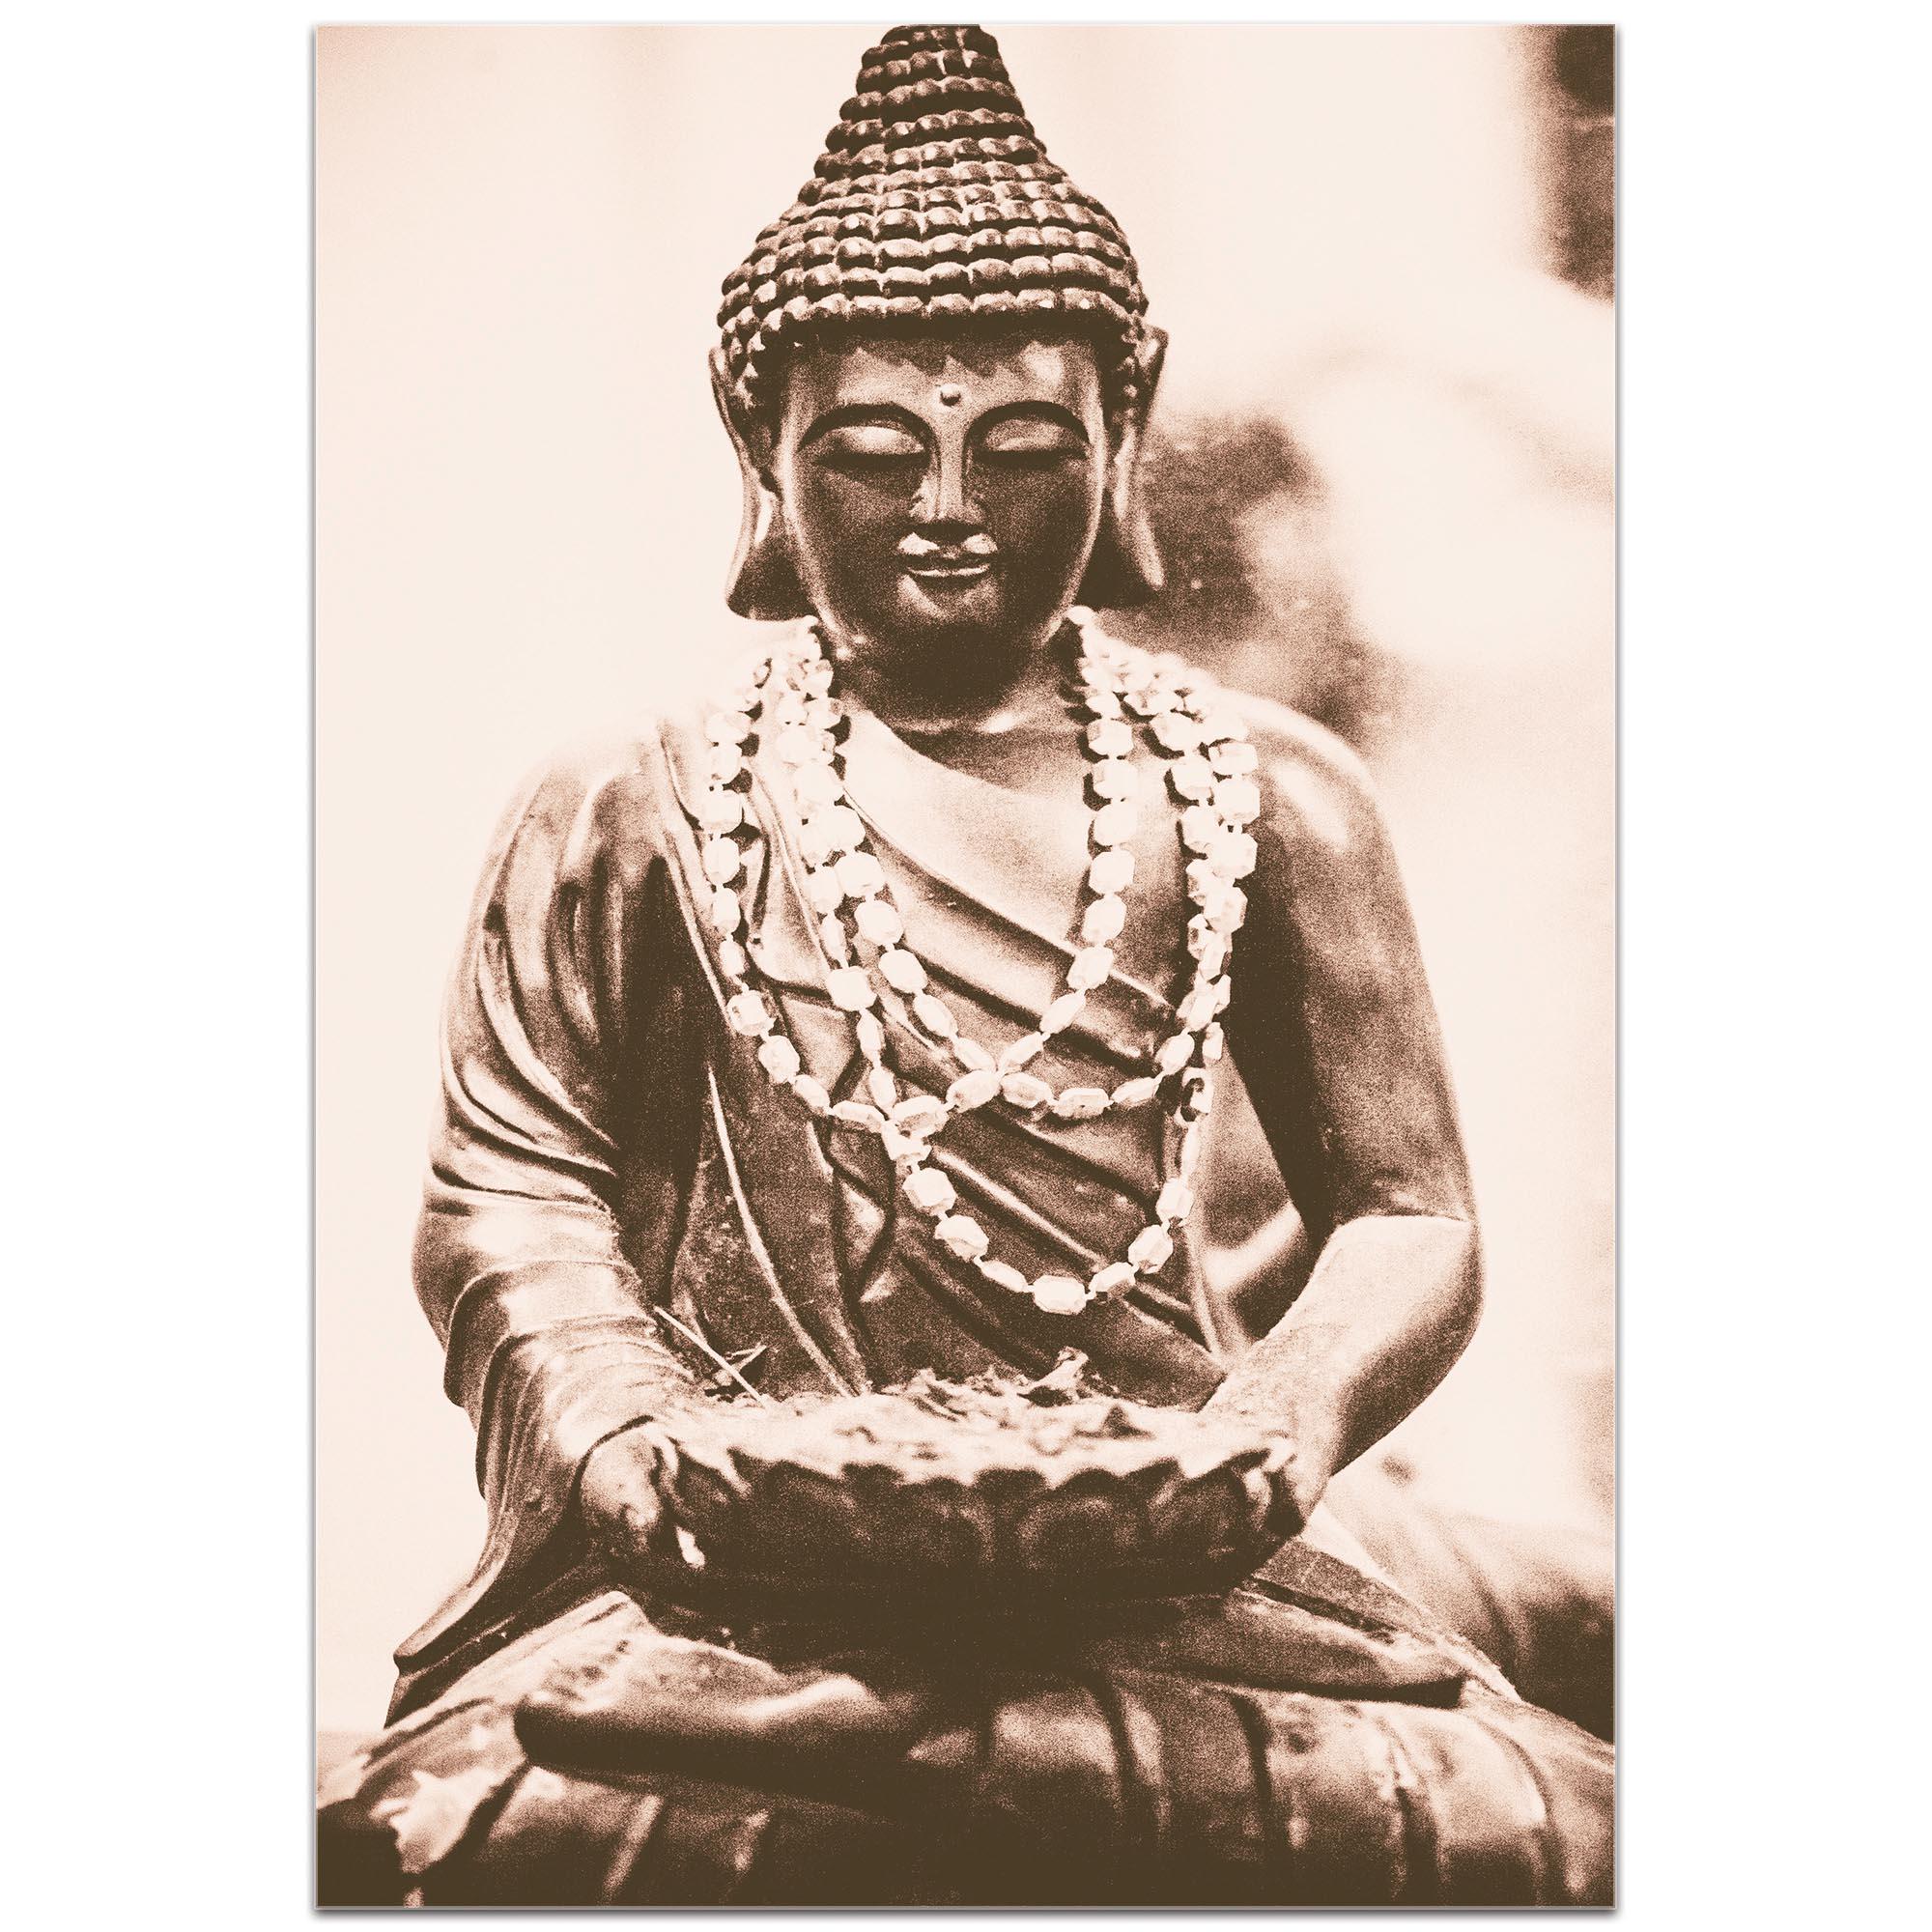 Eclectic Wall Art 'Buddha Statue' - Religion Decor on Metal or Plexiglass - Image 2